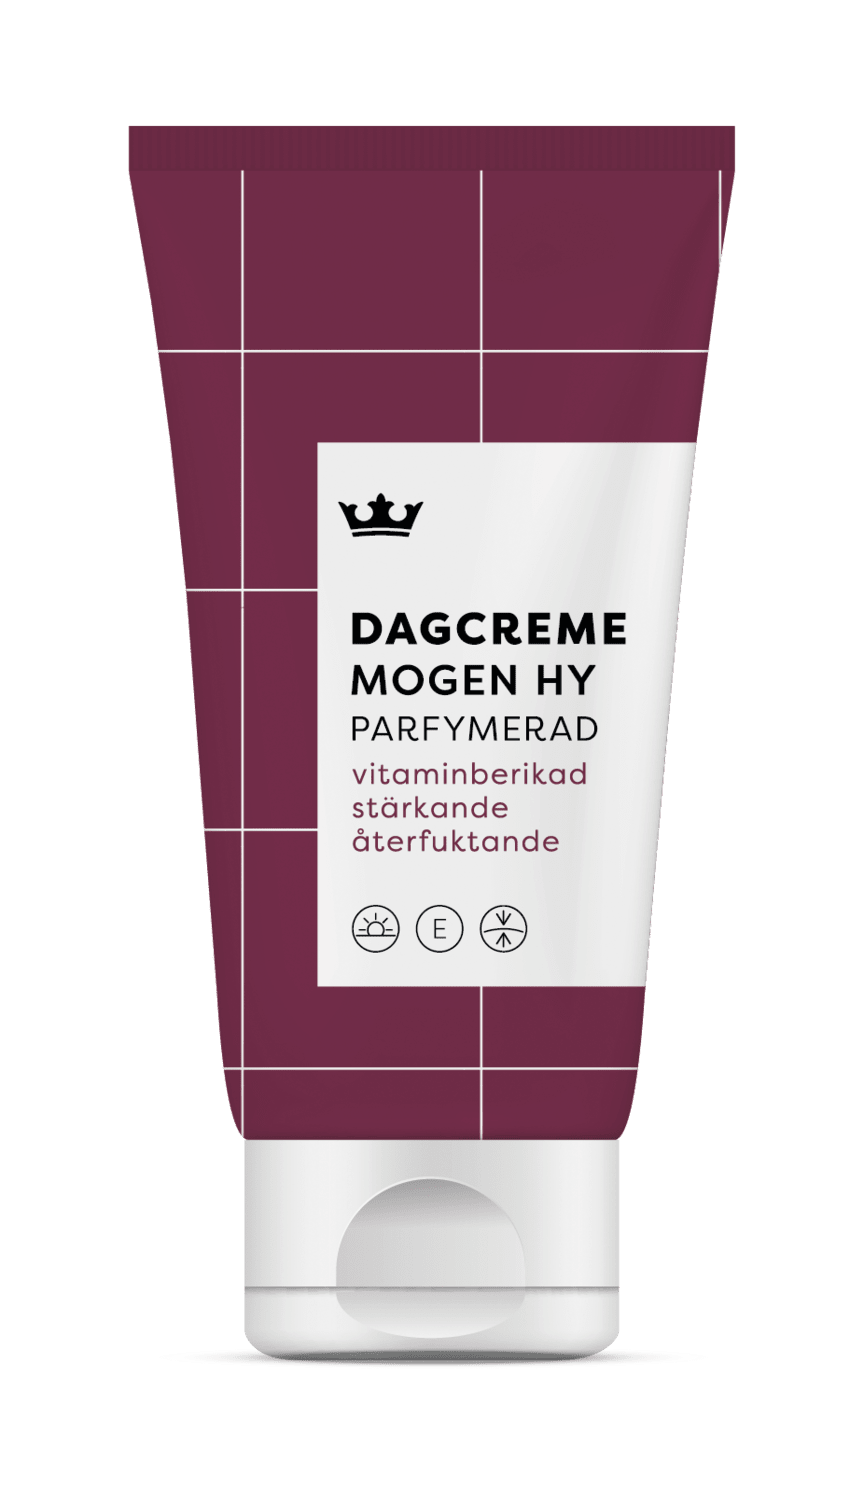 Kronan_Dagcreme Mogen PARF